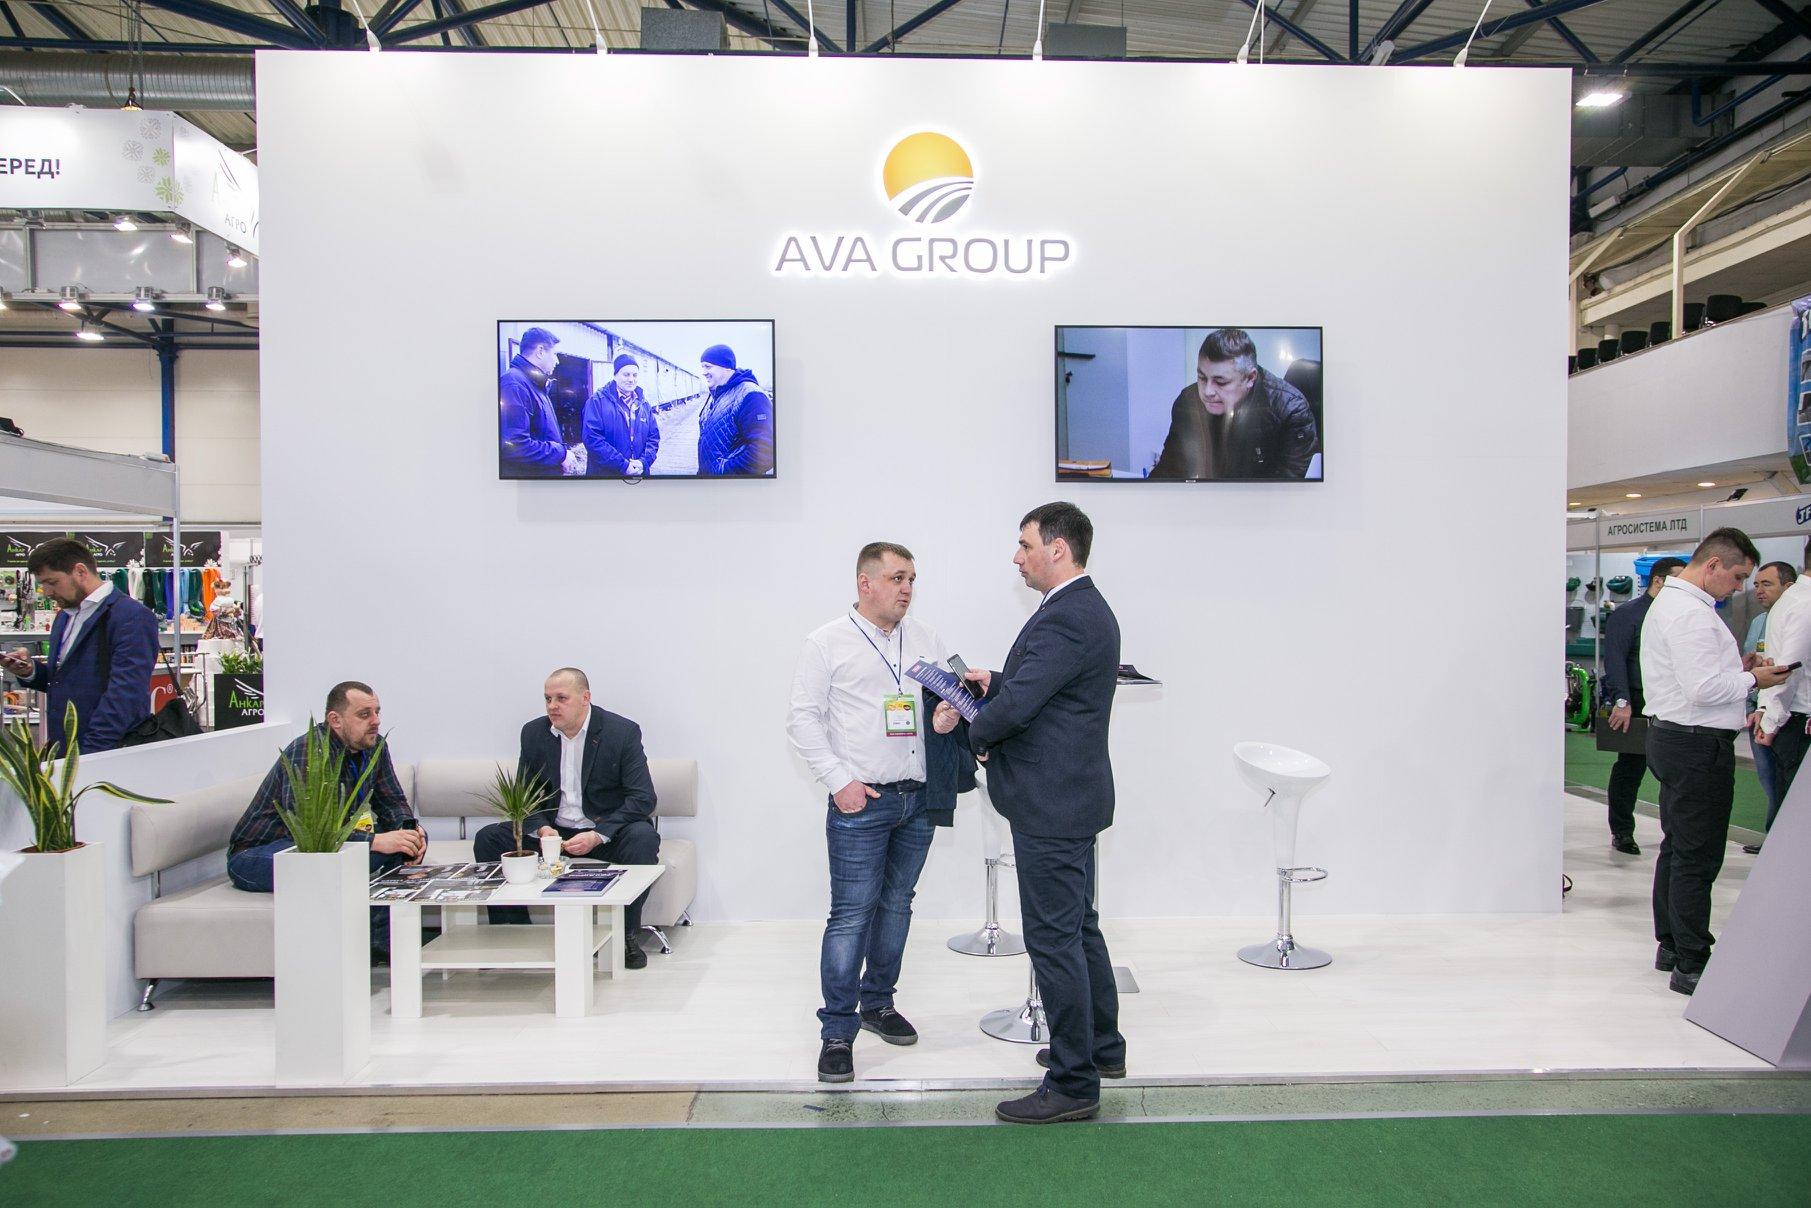 ava_group_1.jpg (275 KB)